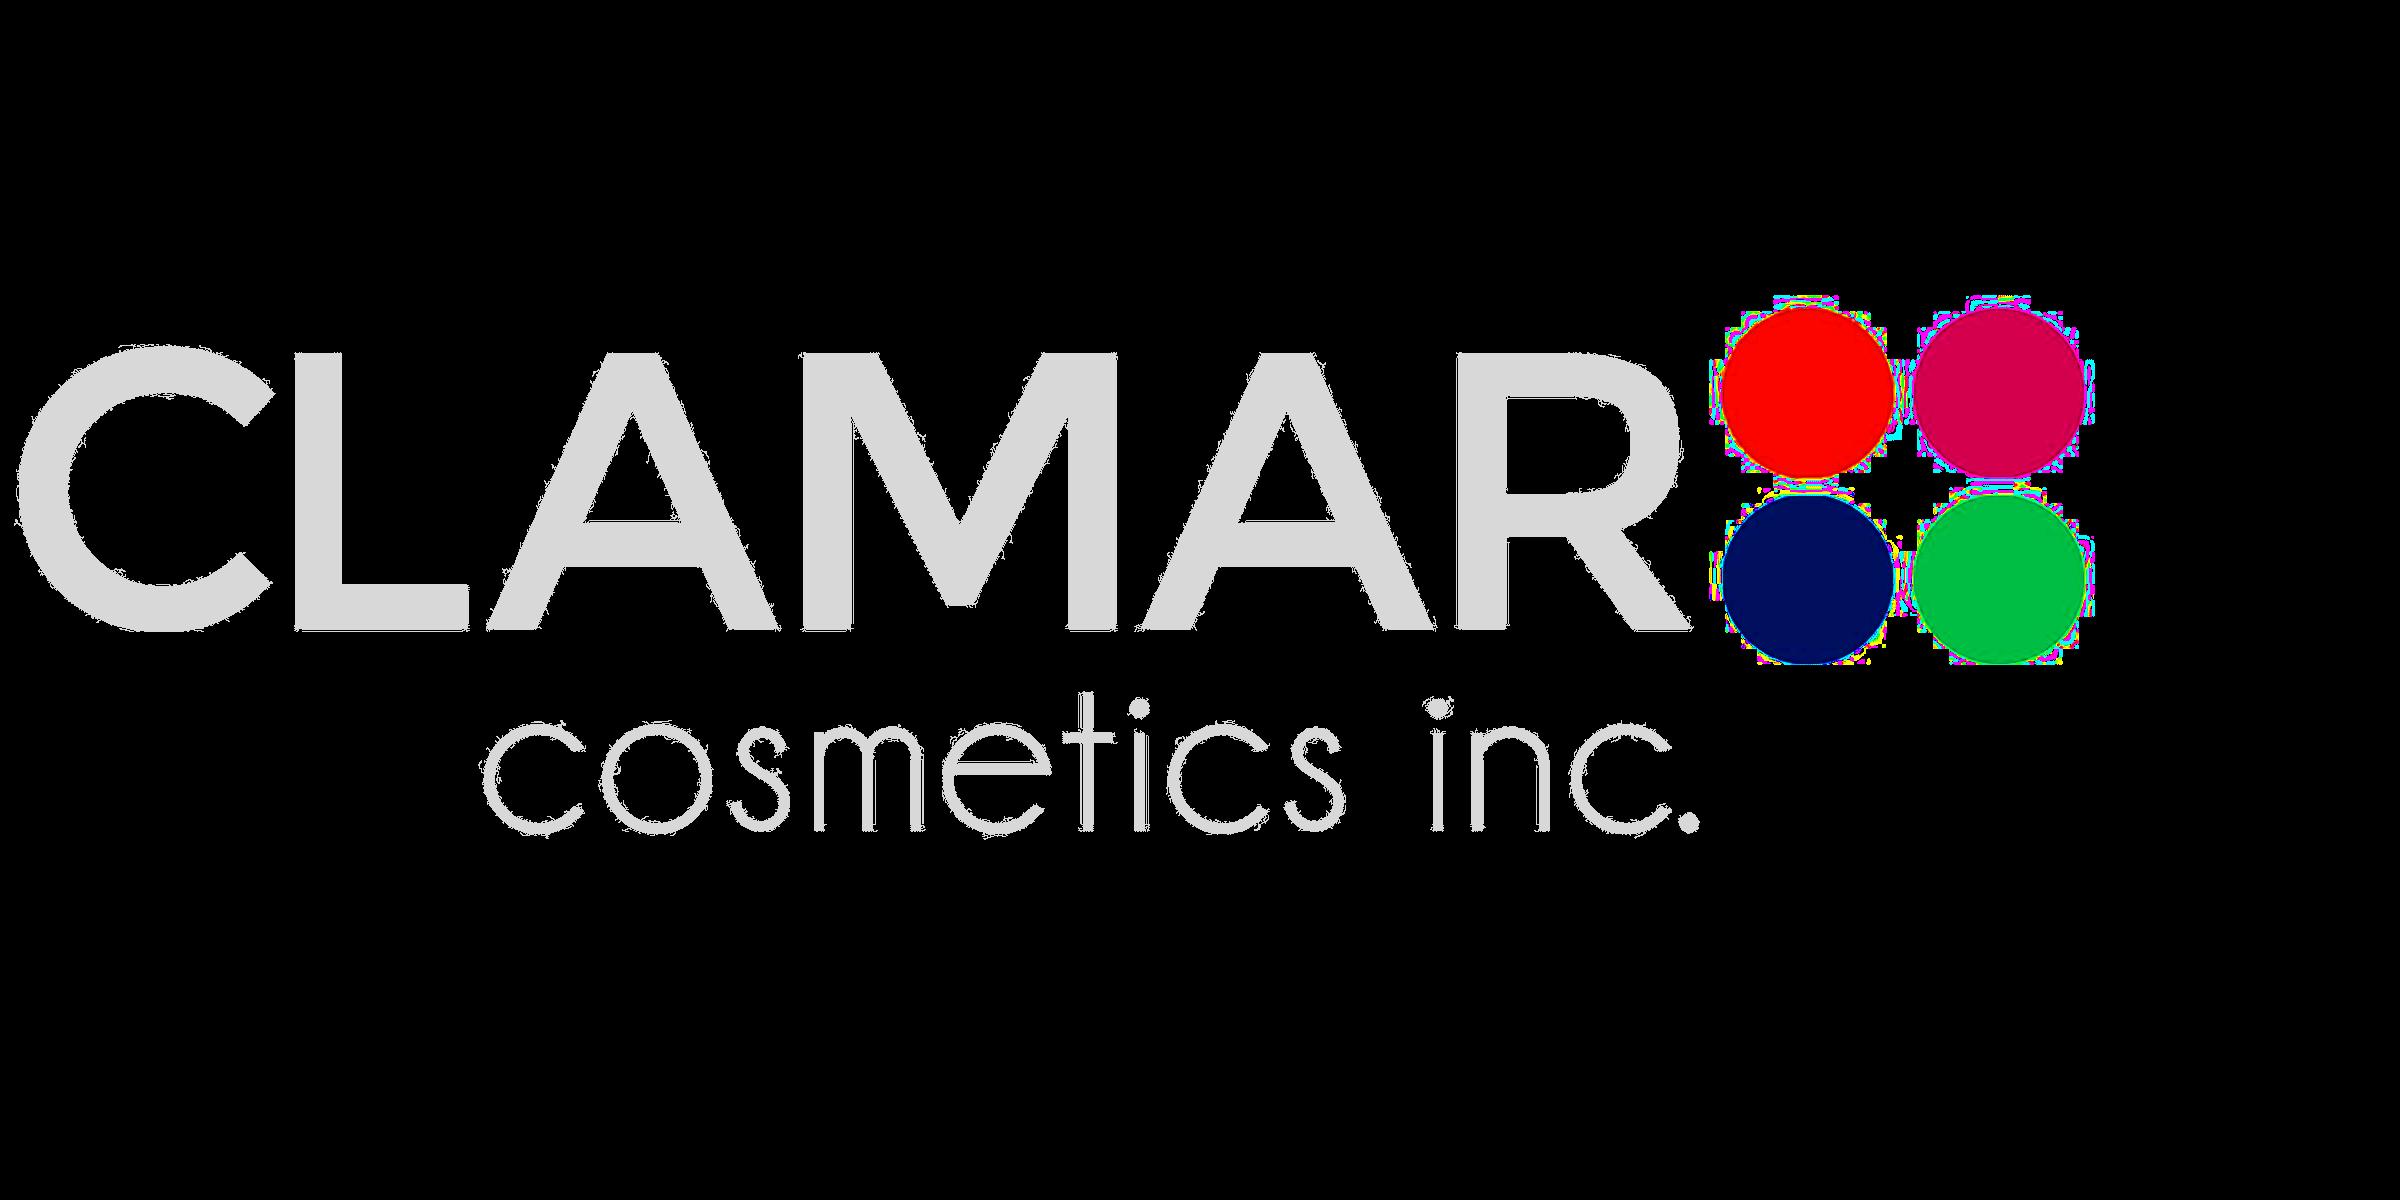 Clamar Cosmetics Inc.|Cosmetics & Skin Care Product Manufacturing